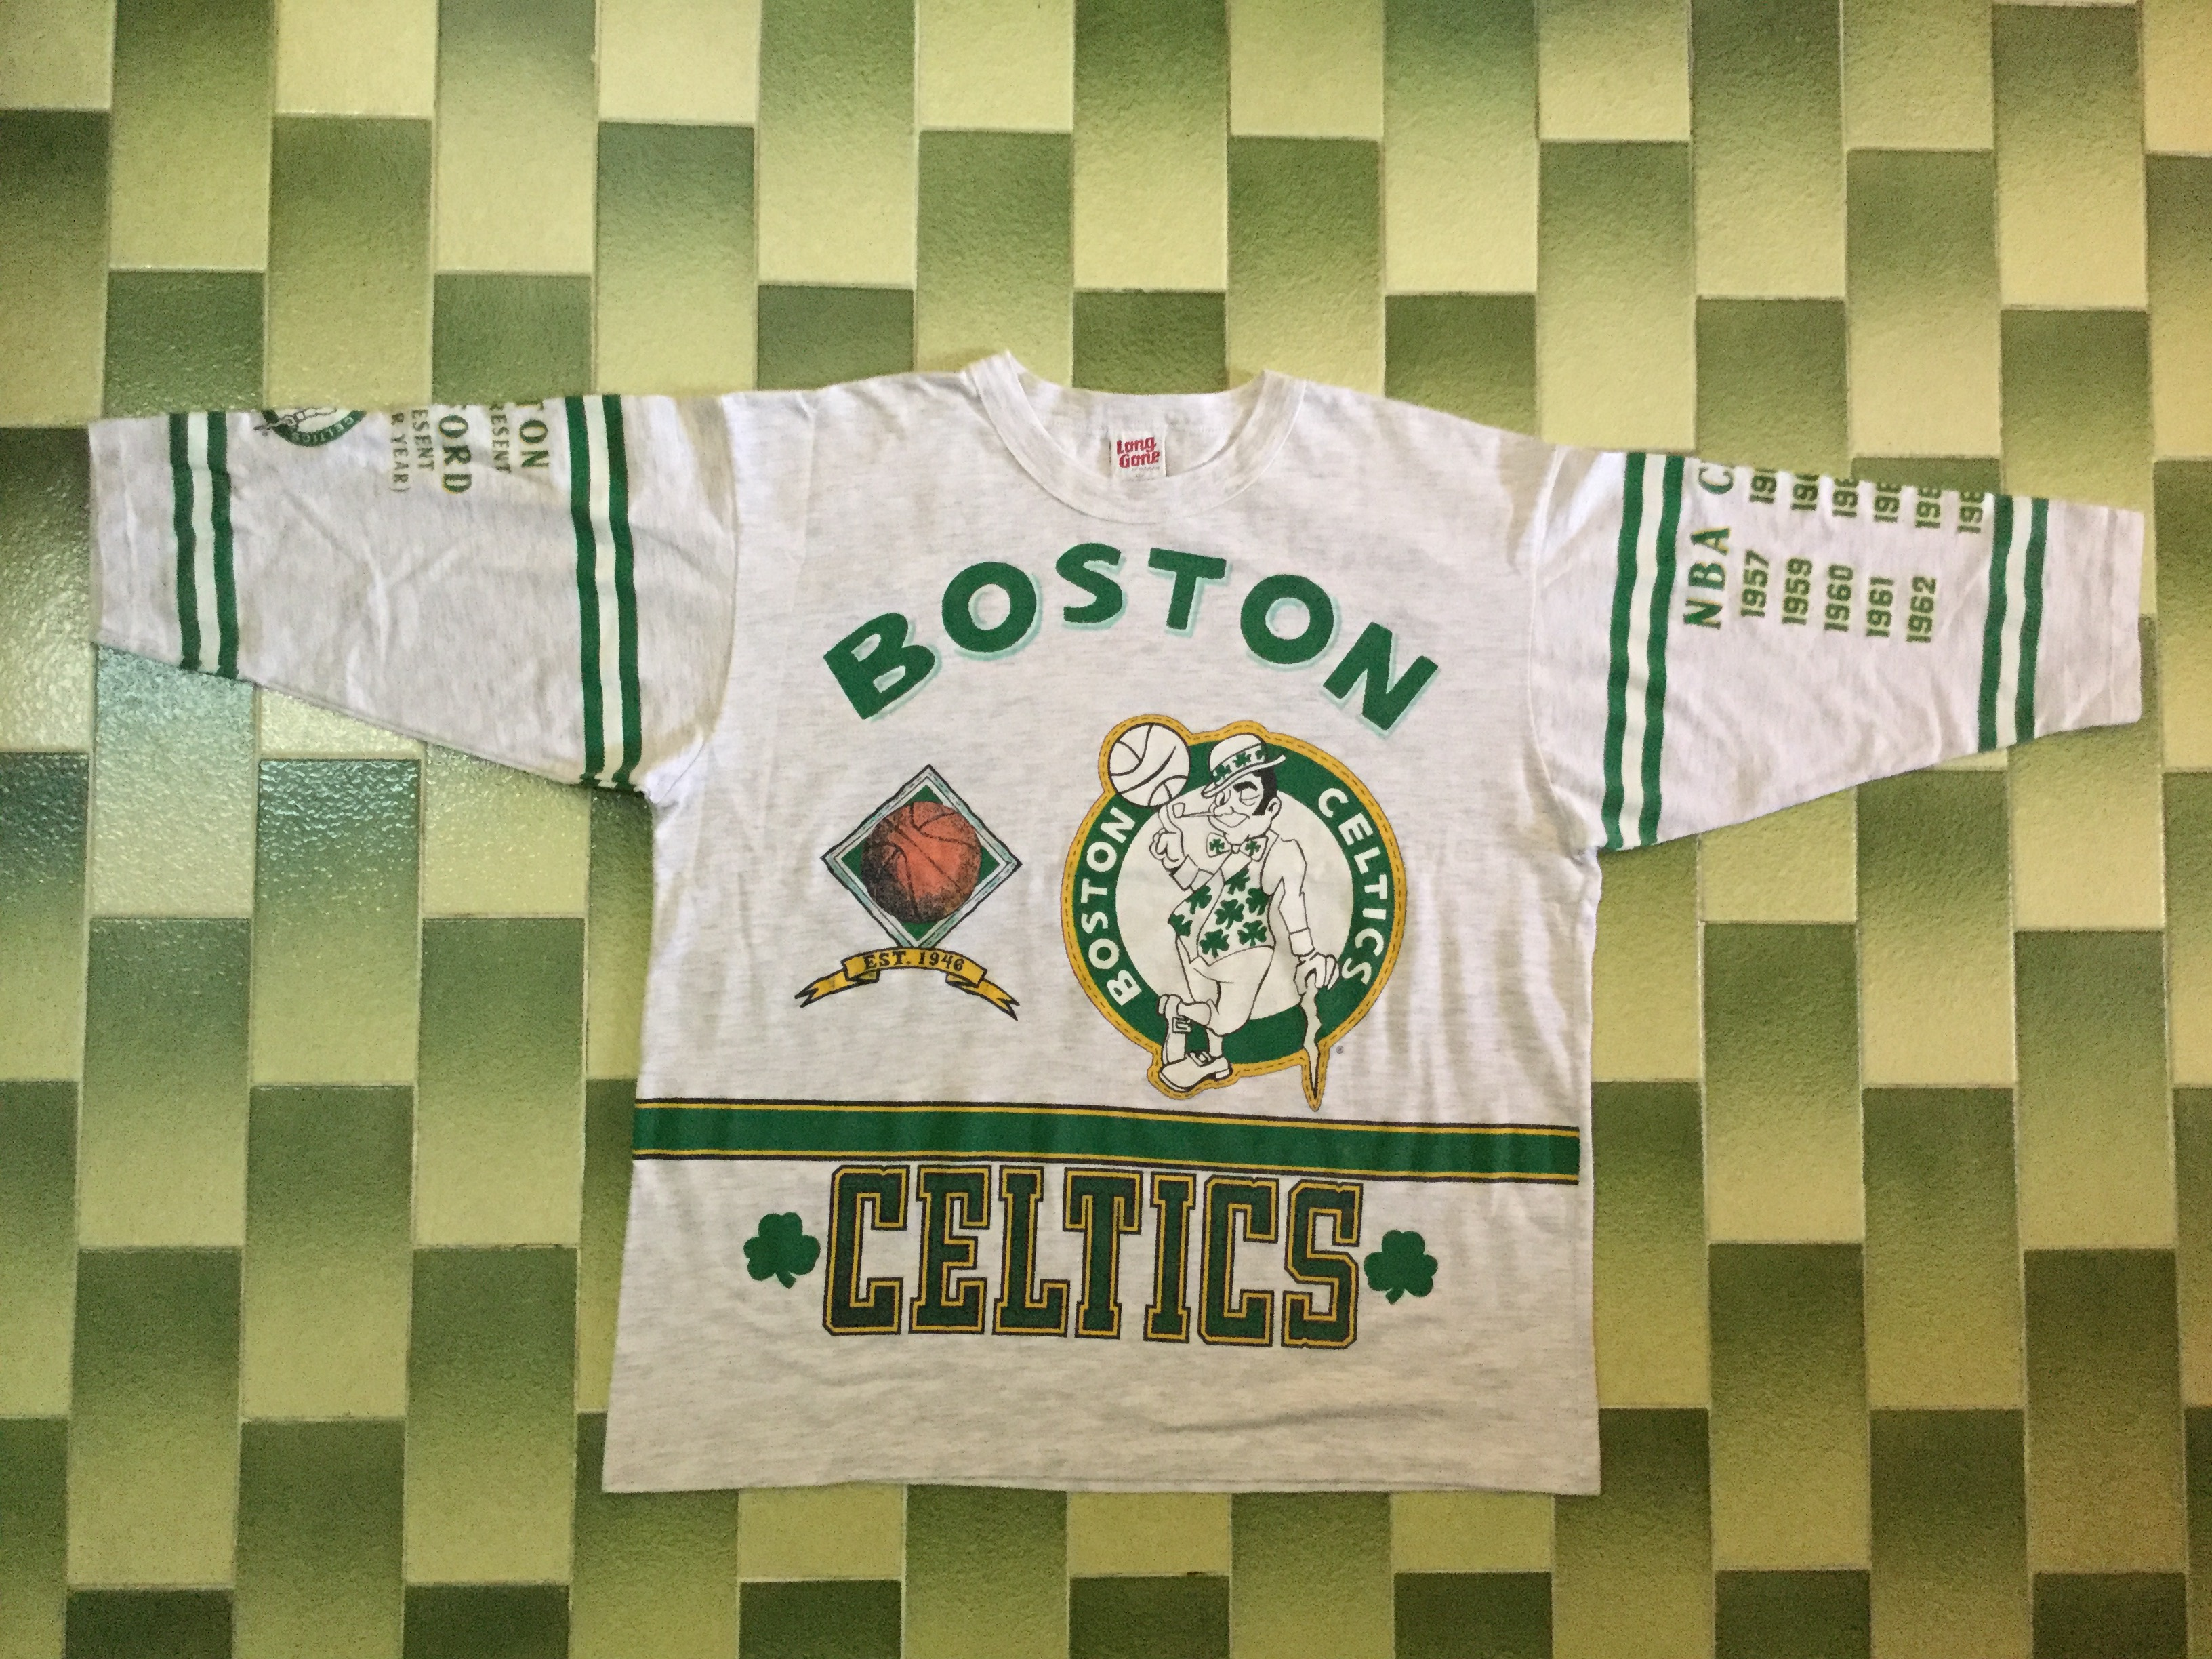 e7b0b4fe17a4 Vintage × Nba × Boston Celtics ×. Vintage NBA Boston Celtics Raglan all  over print t-shirt american basketball ...